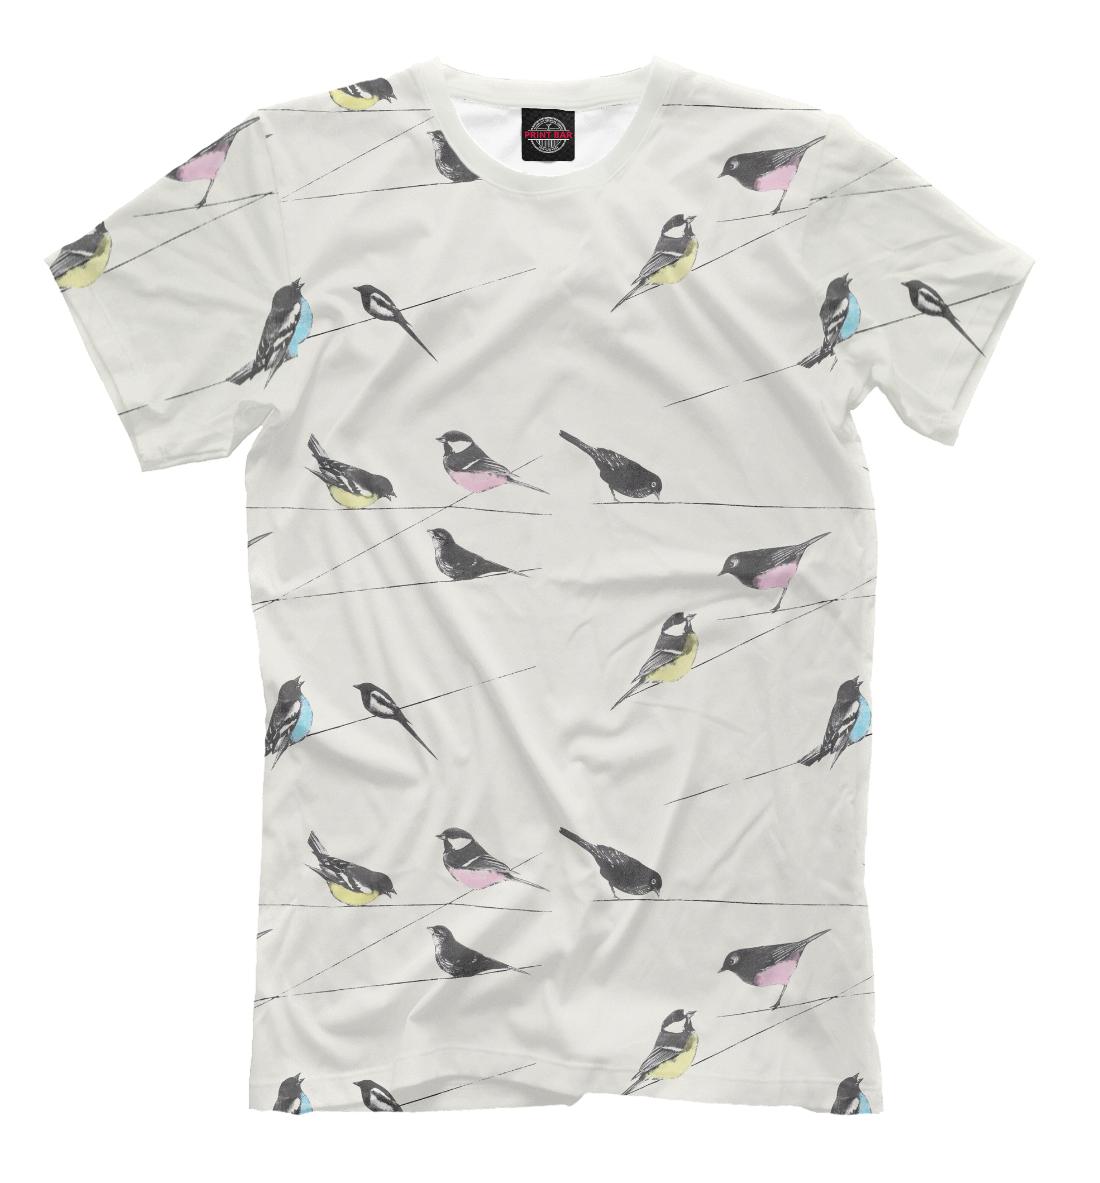 Купить Birdy, Printbar, Футболки, PTI-574817-fut-2